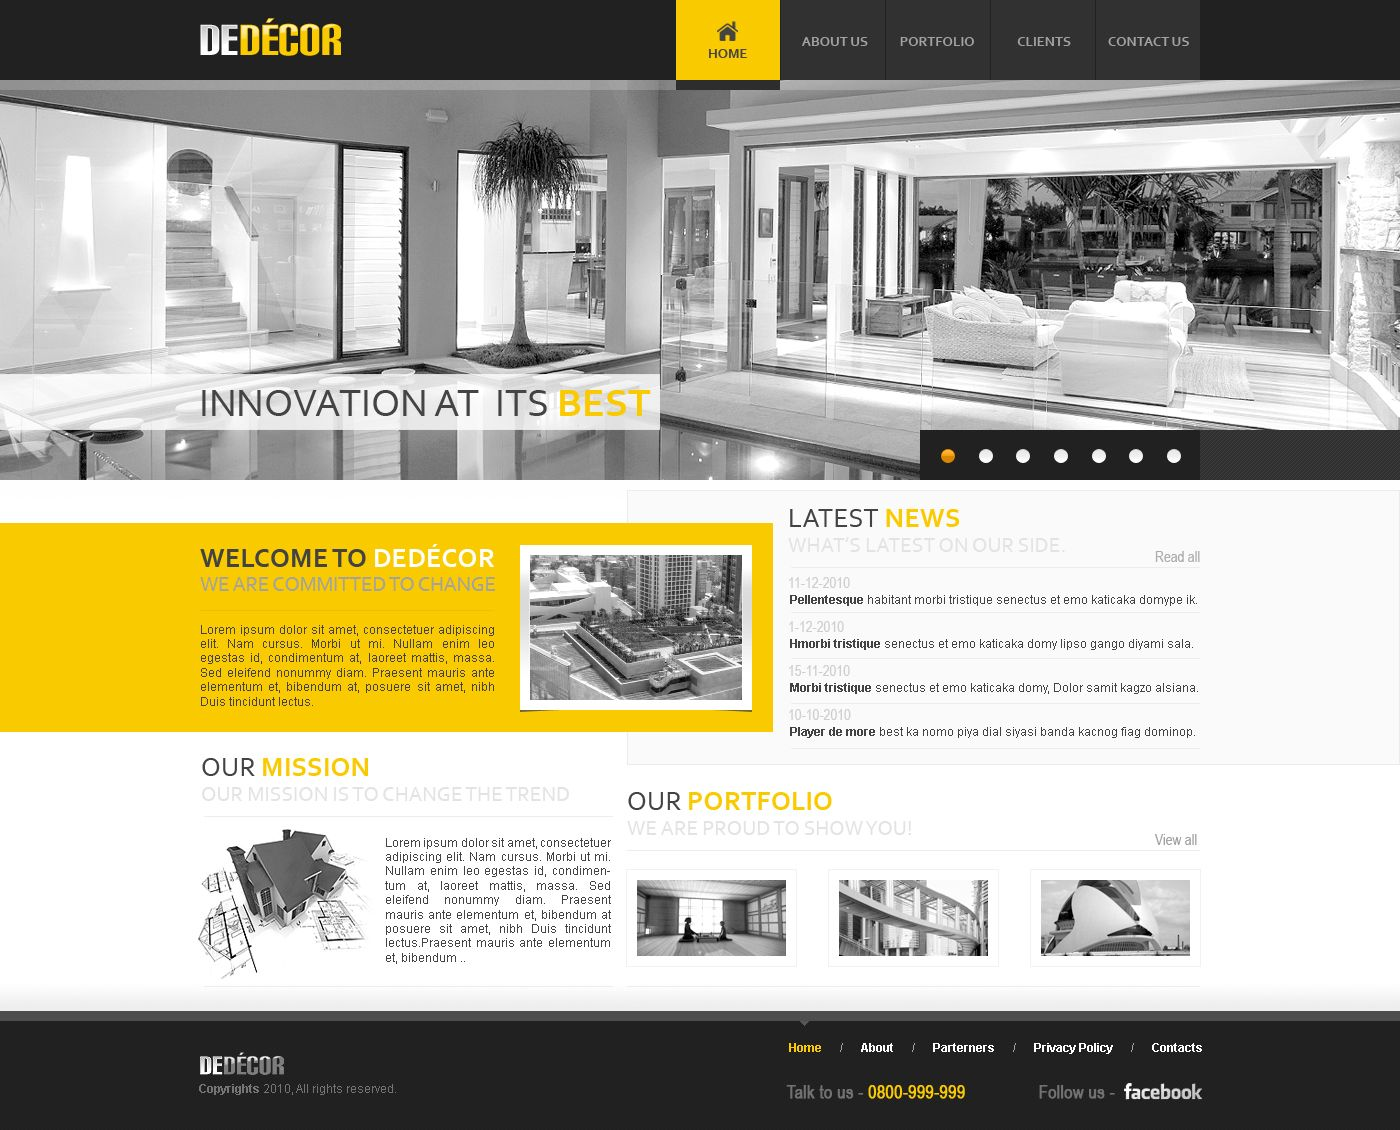 Pin By Chelsea Eason On Inspiration Web Web Design Web Design Inspiration Web App Design